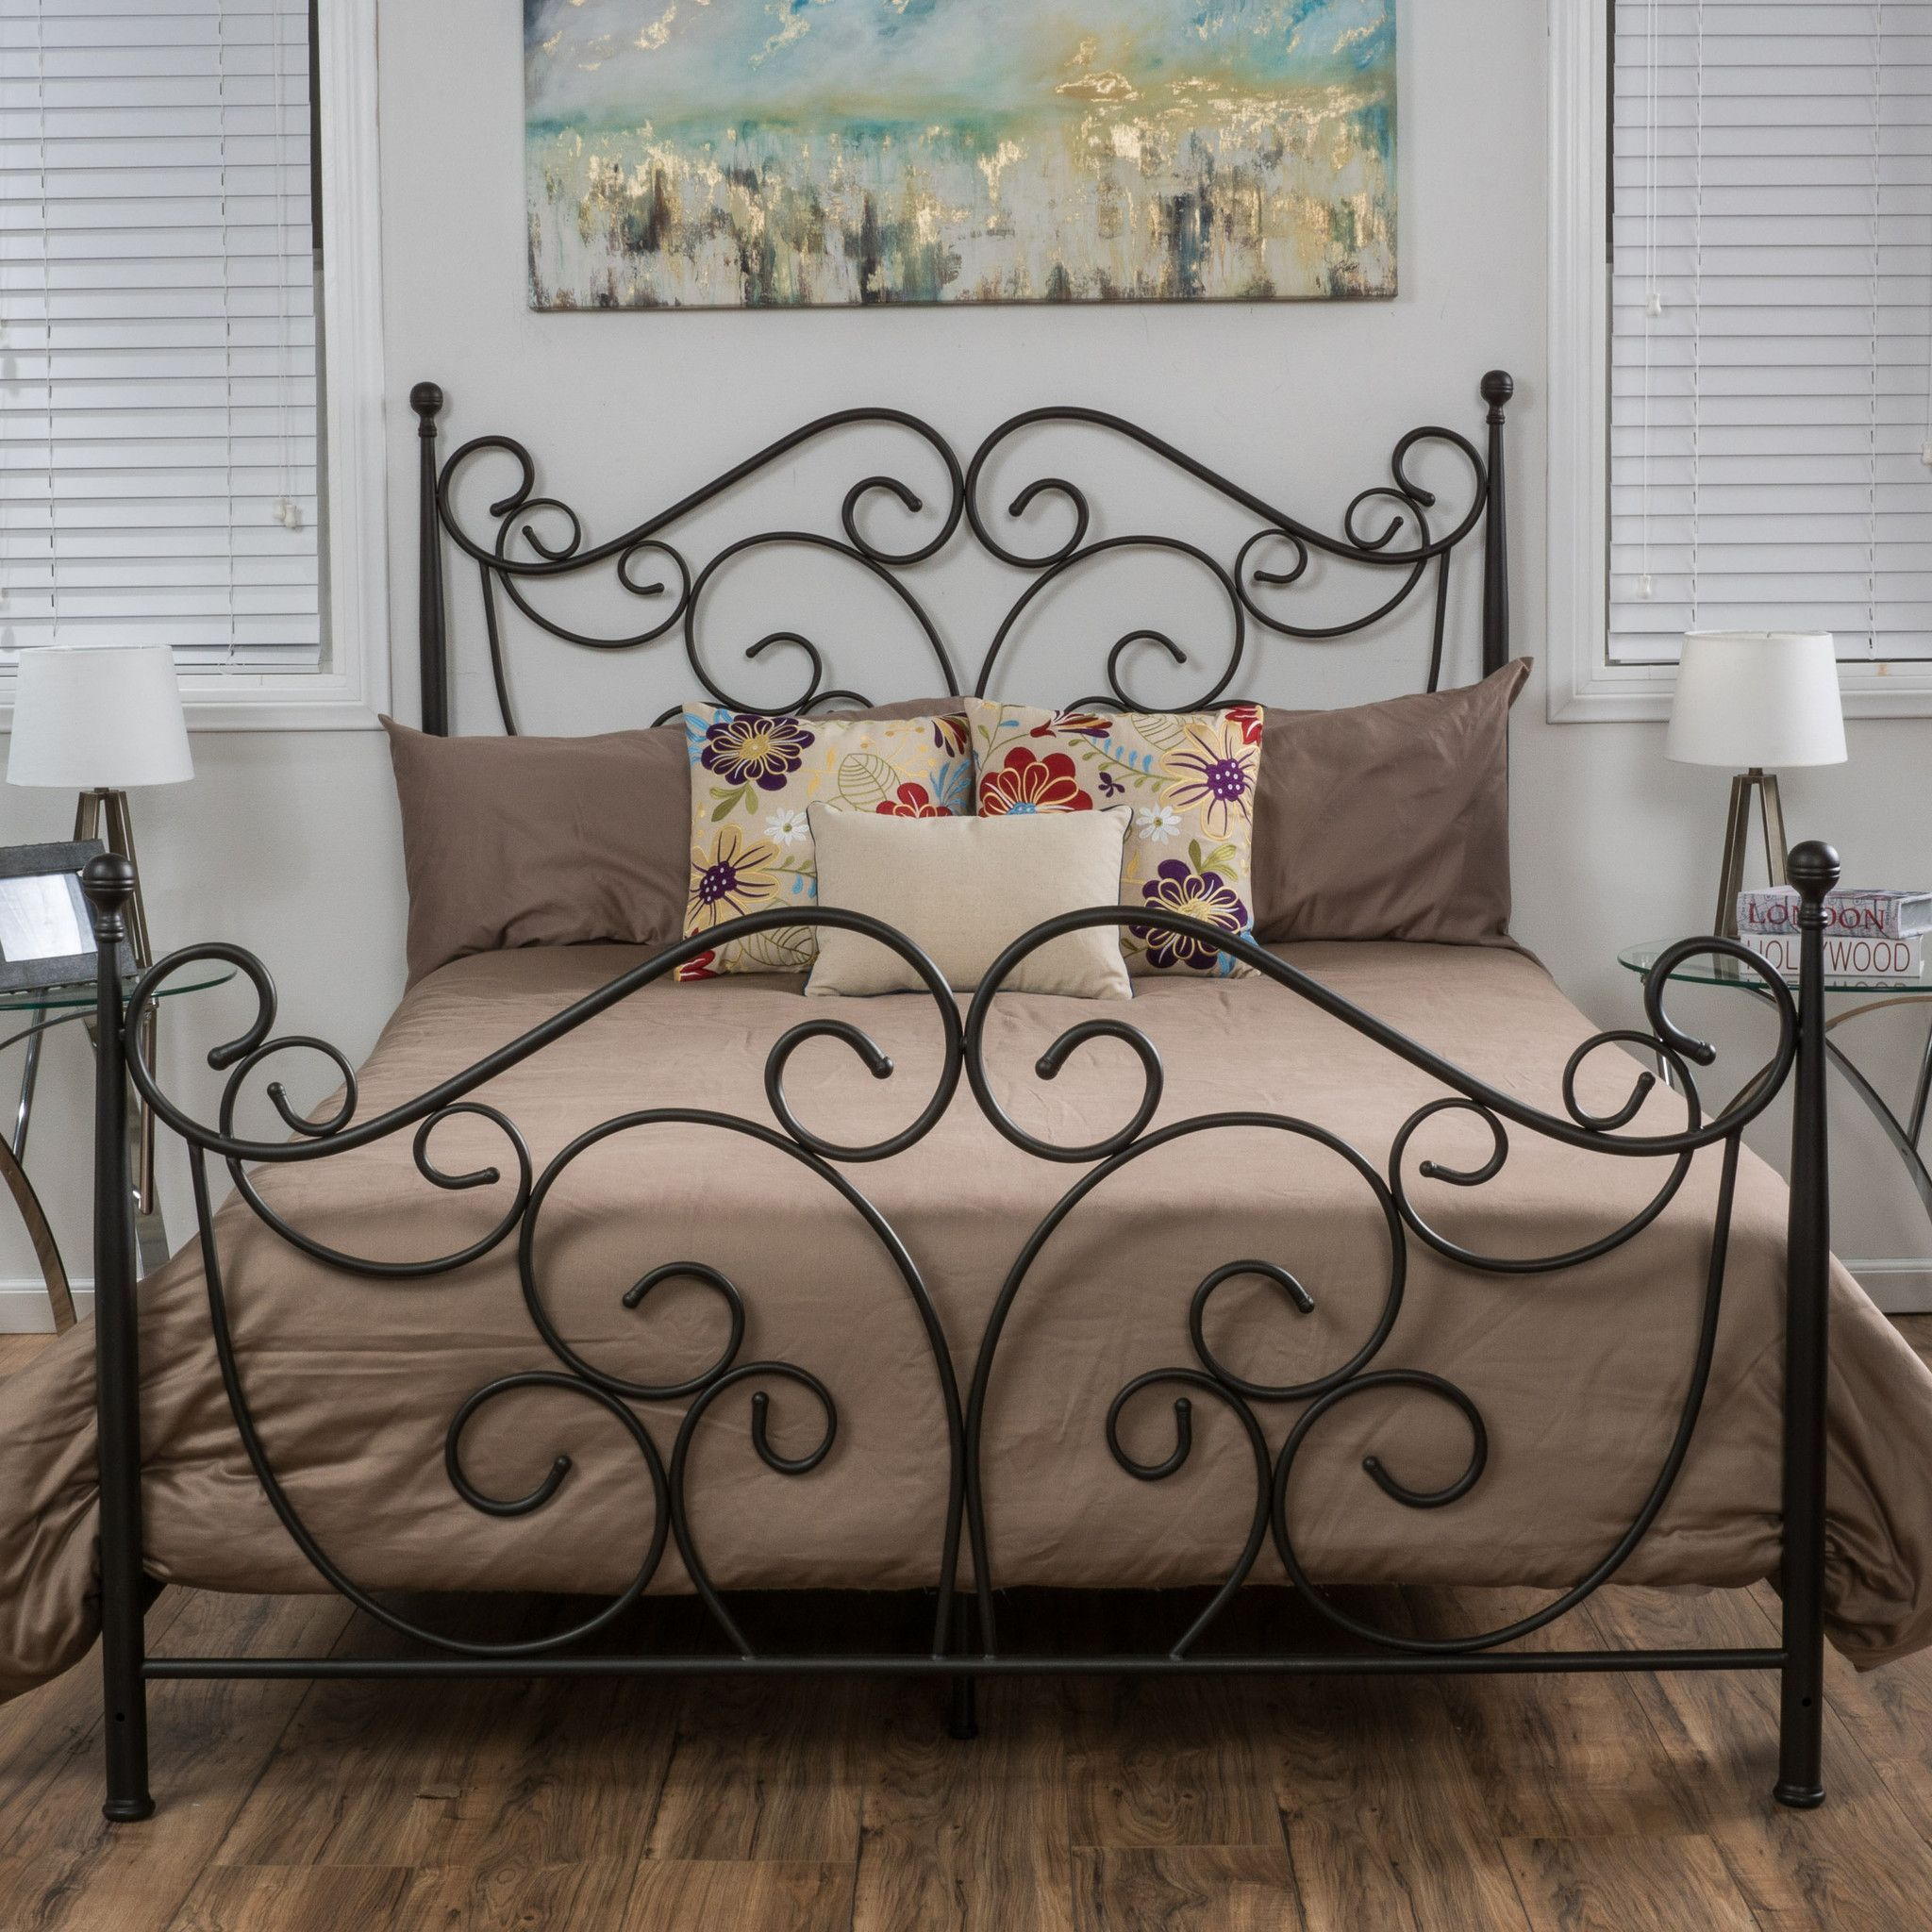 Denise austin home horatio metal bed frame denise austin metal